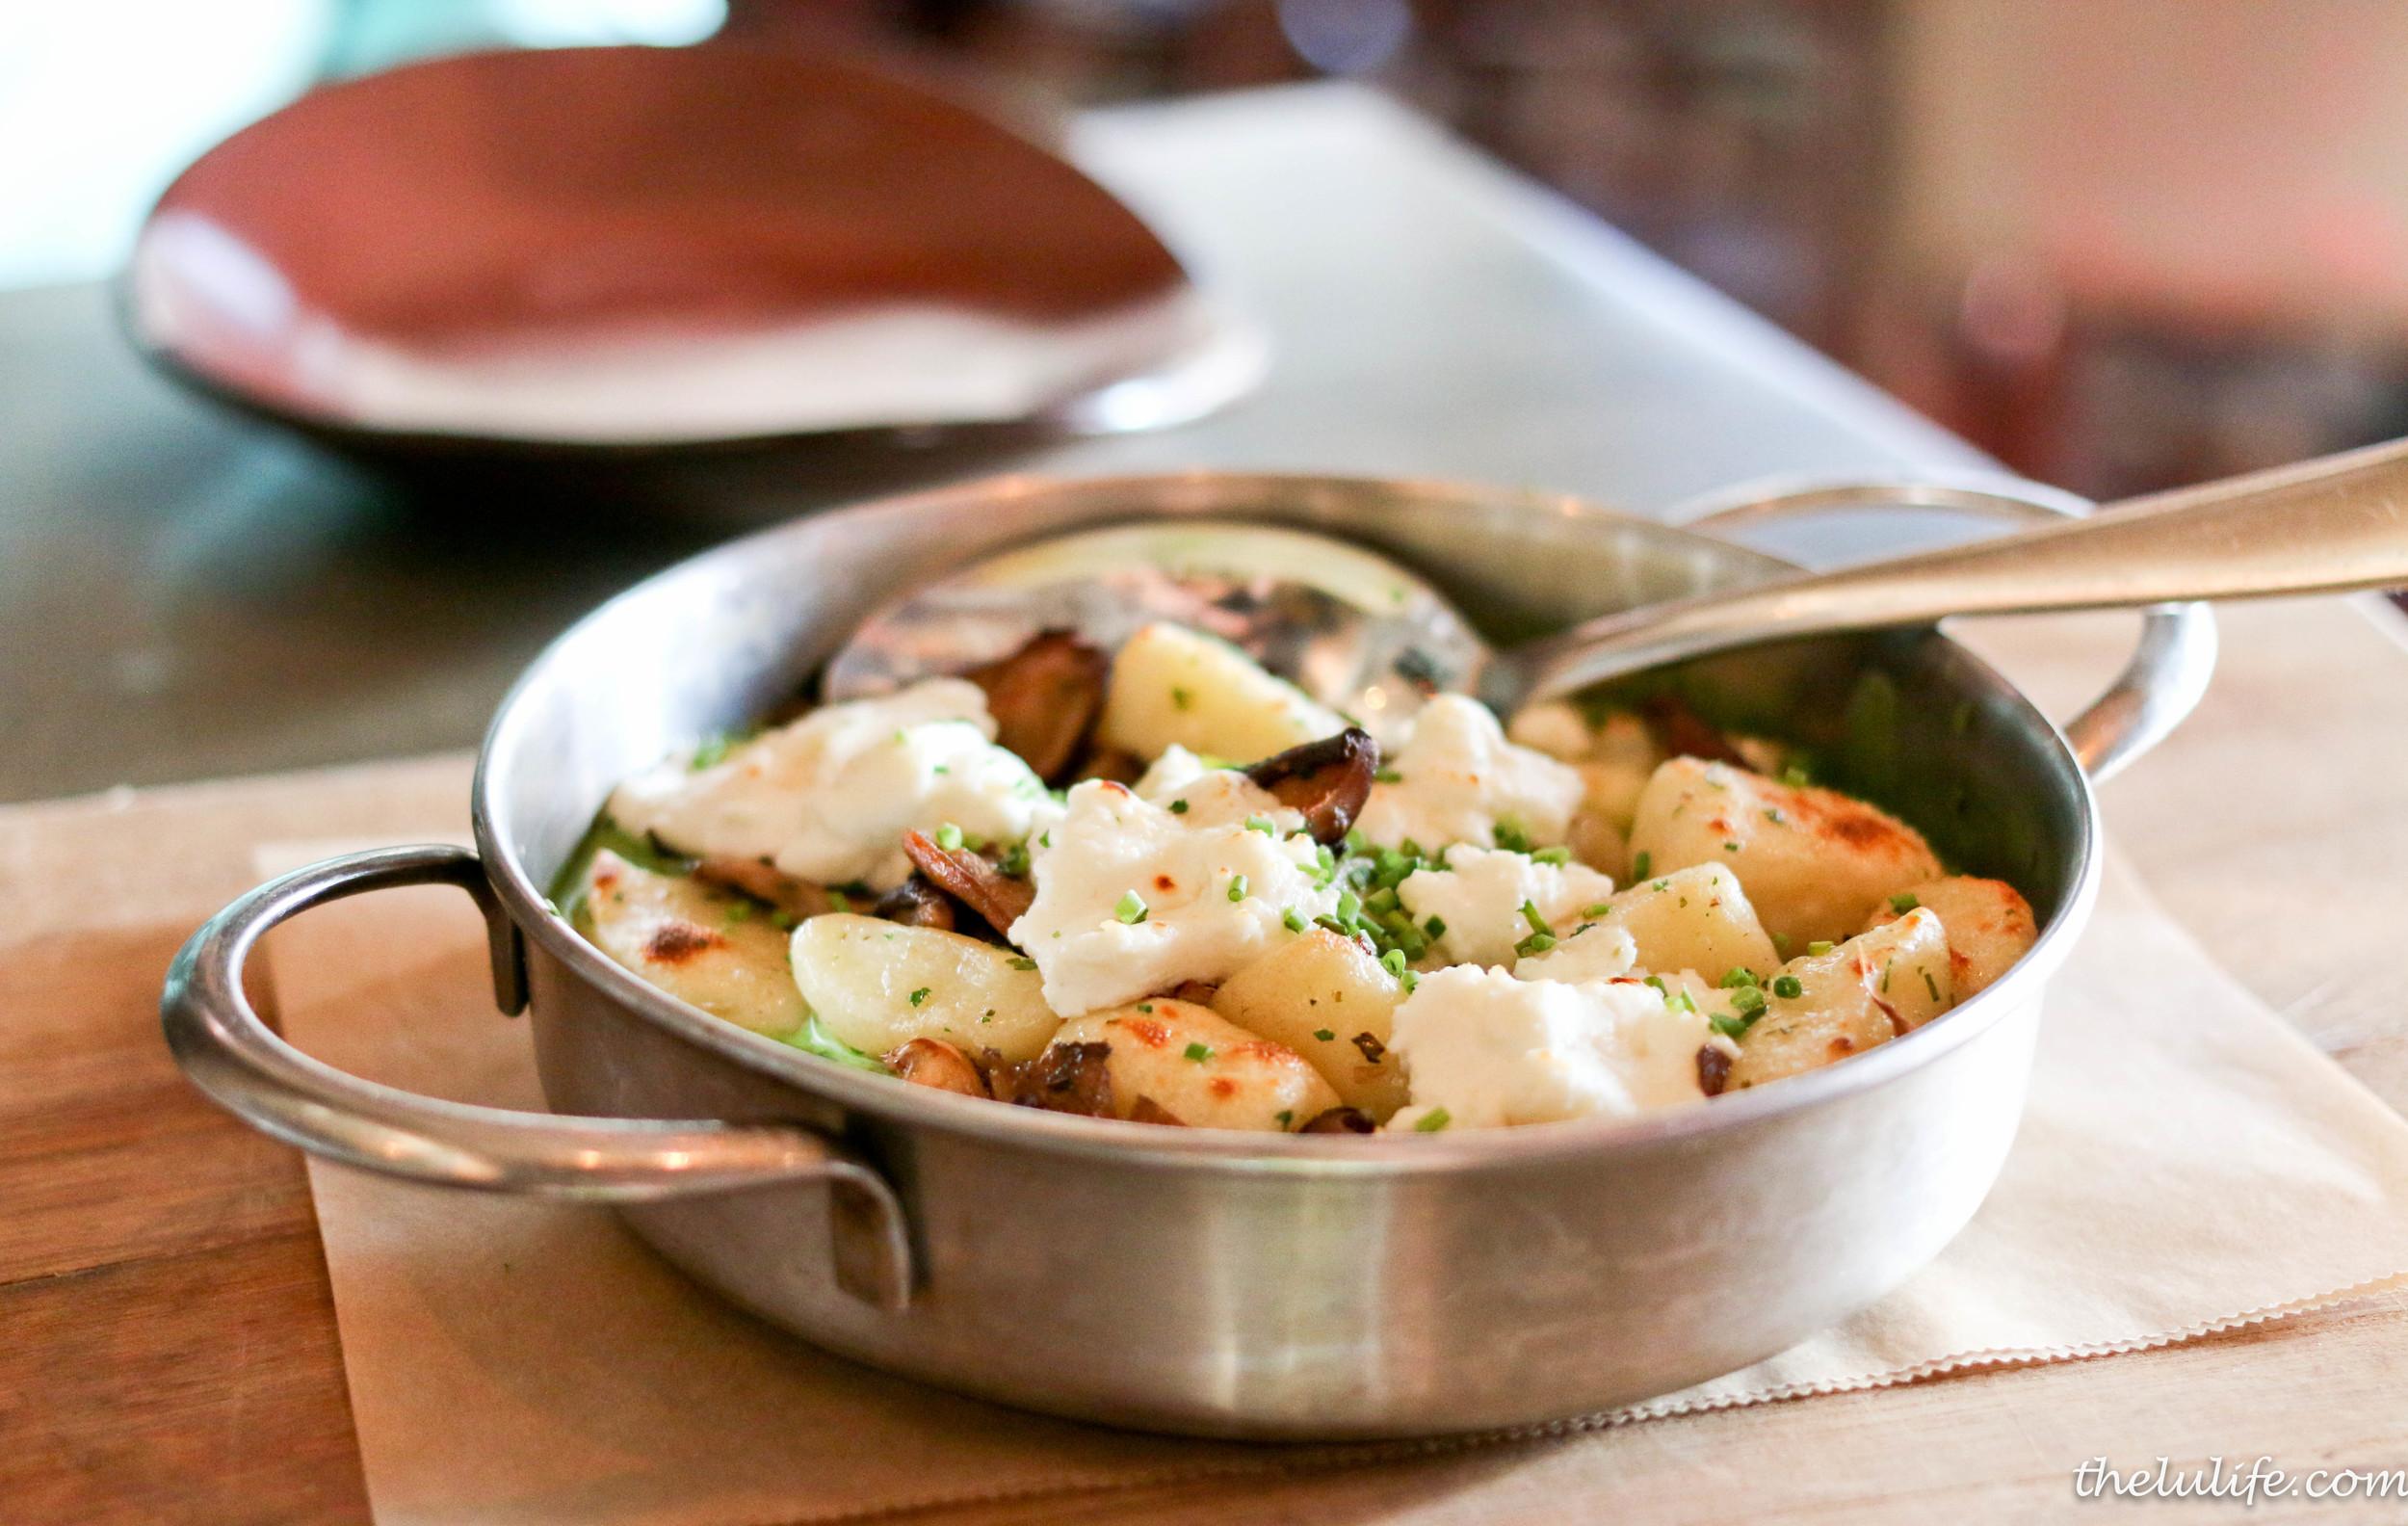 Potato gnocchi with spring mushrooms, stinging nettles, fresh goat cheese